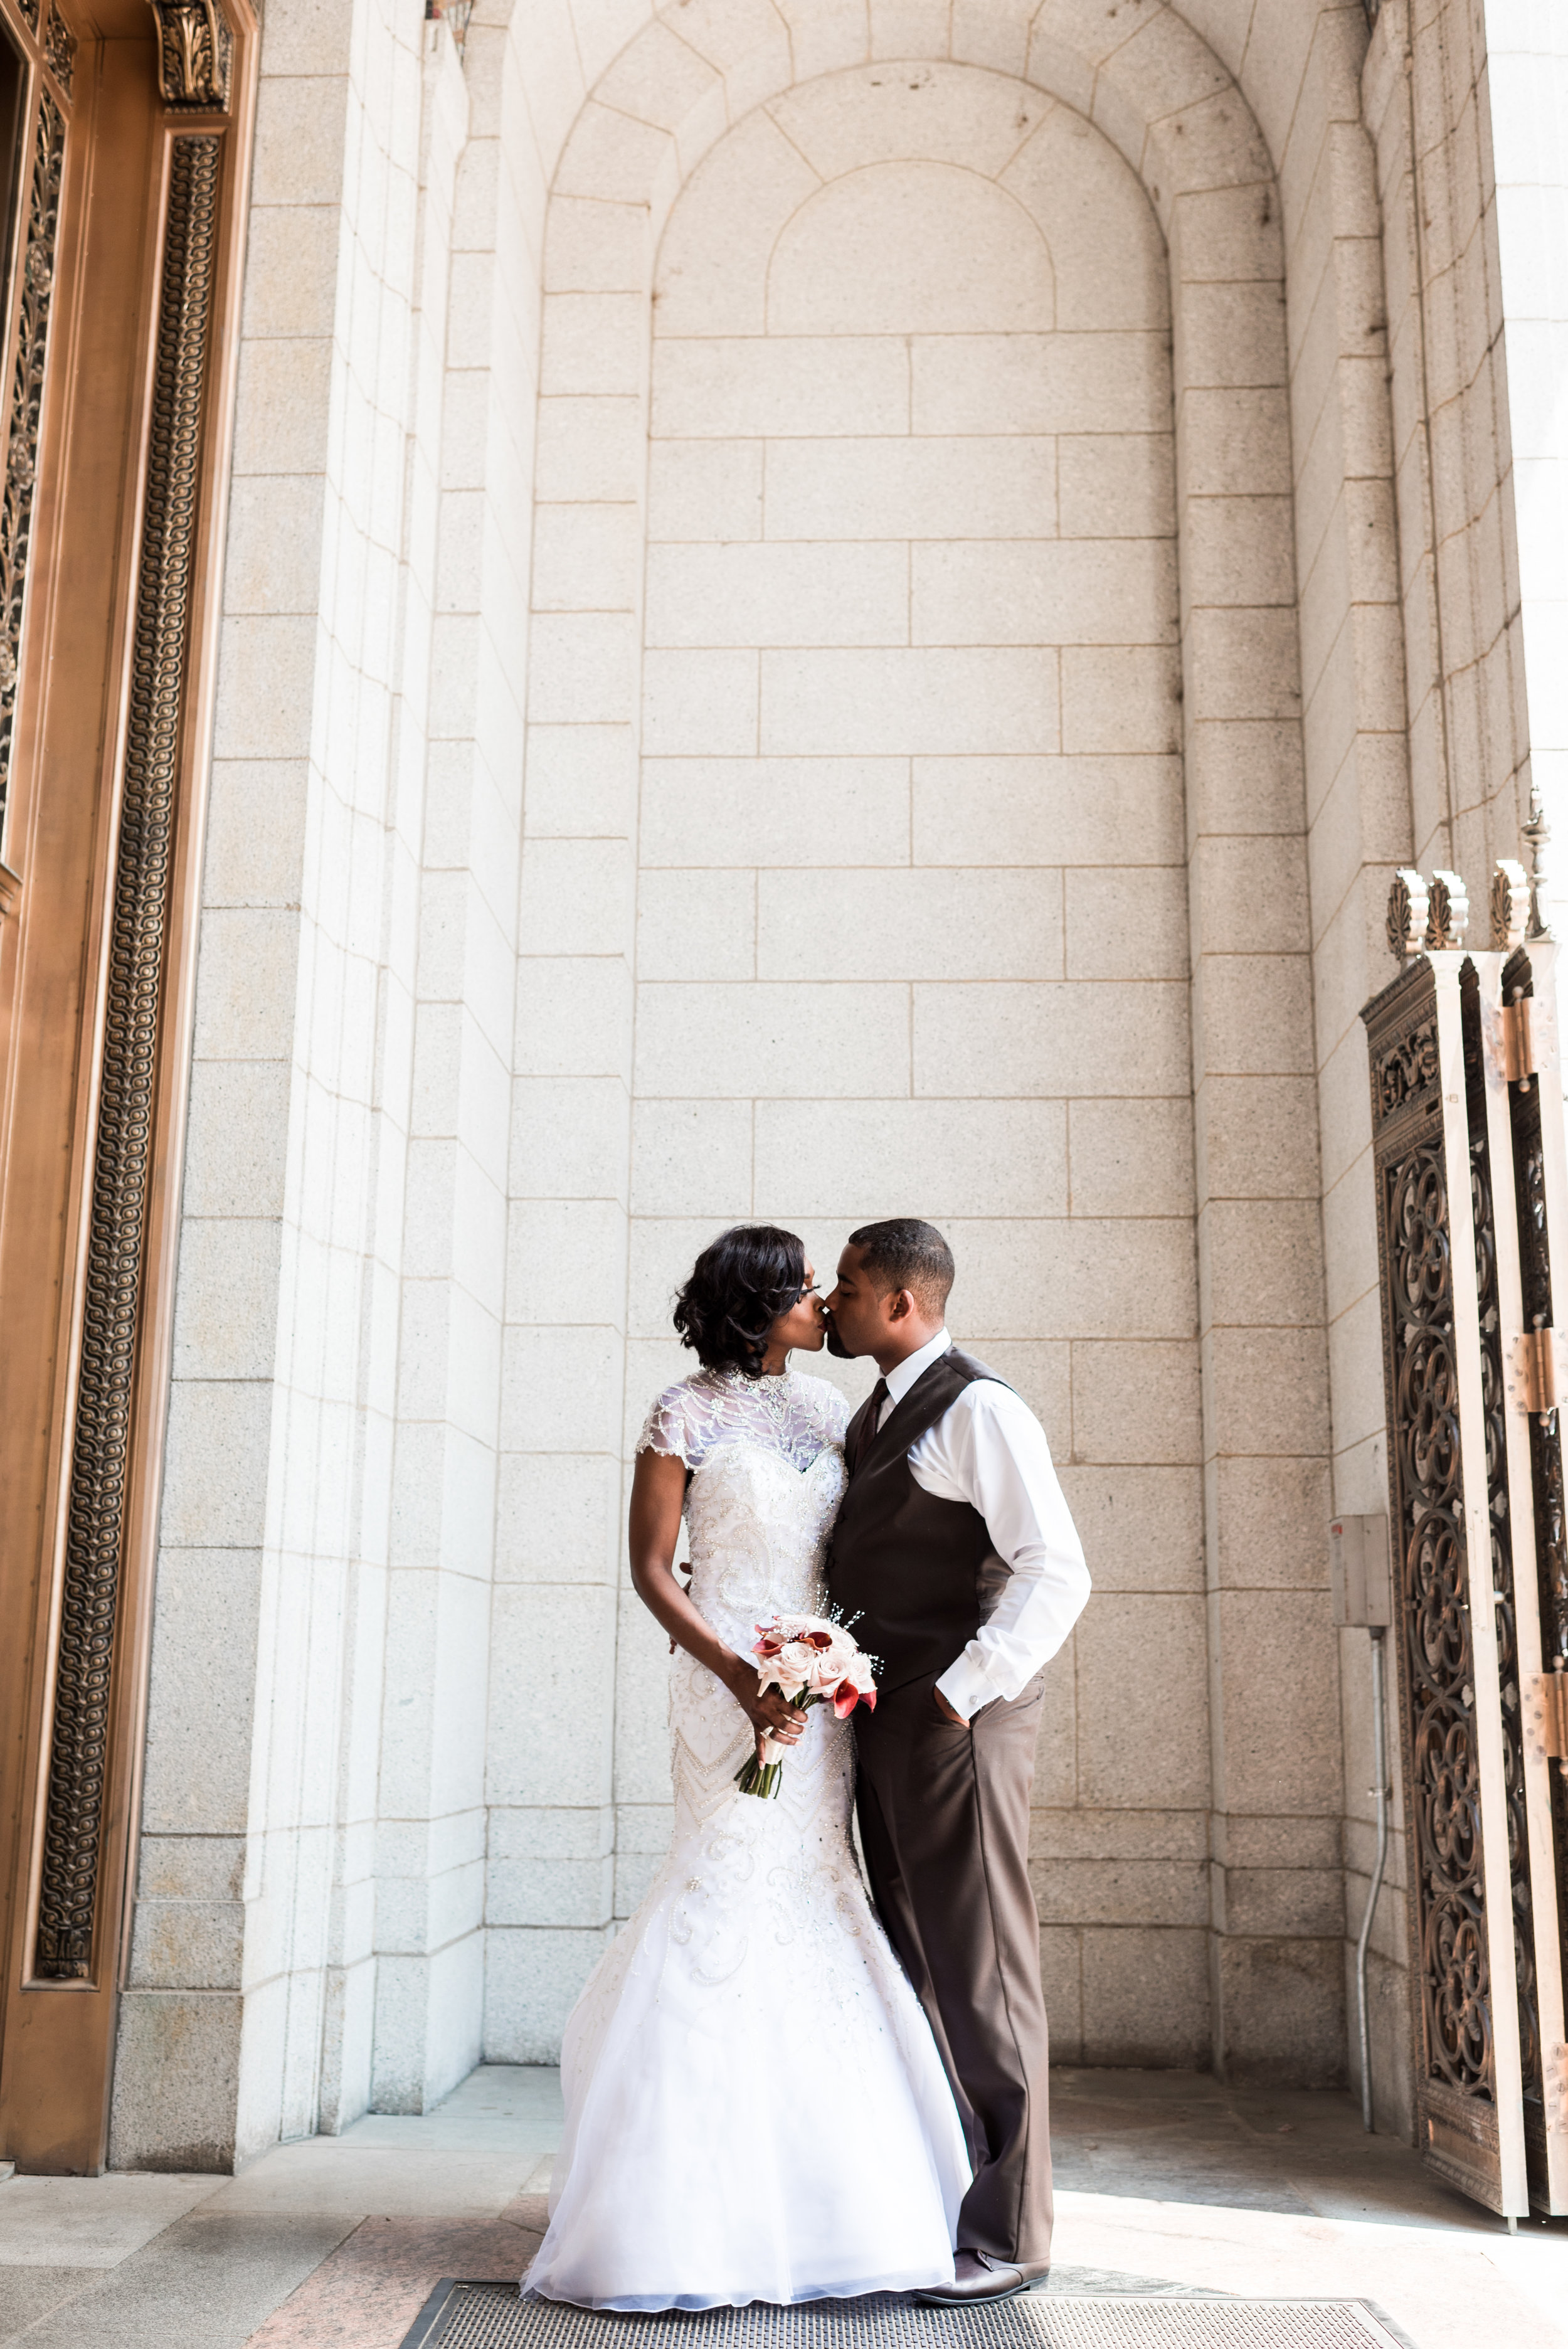 st-louis-wedding-photographer-third-baptist-church-273.jpg